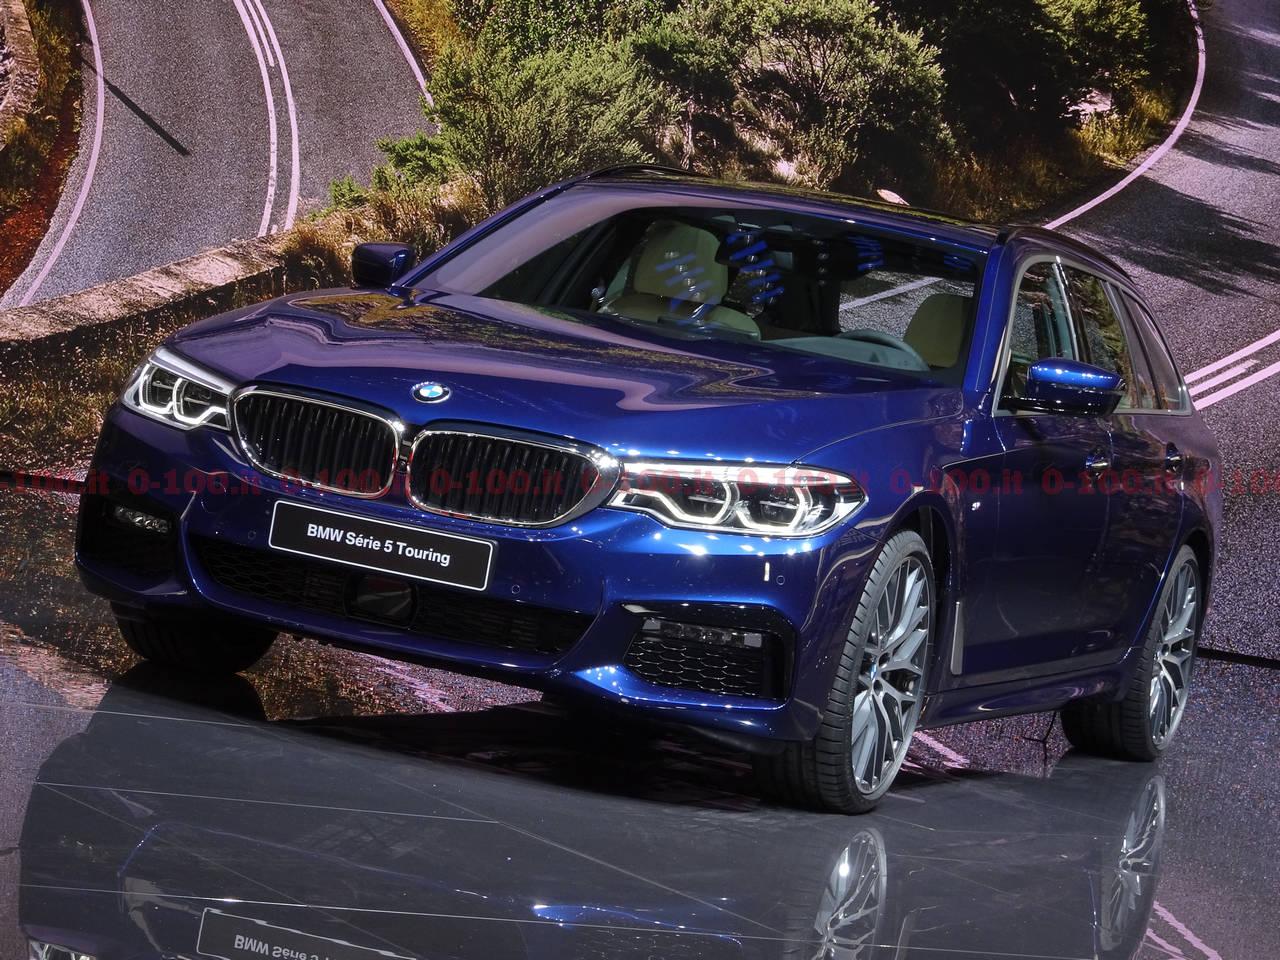 Ginevra-geneva-geneve-2017-BMW_Serie-5-Touring_0-100_9